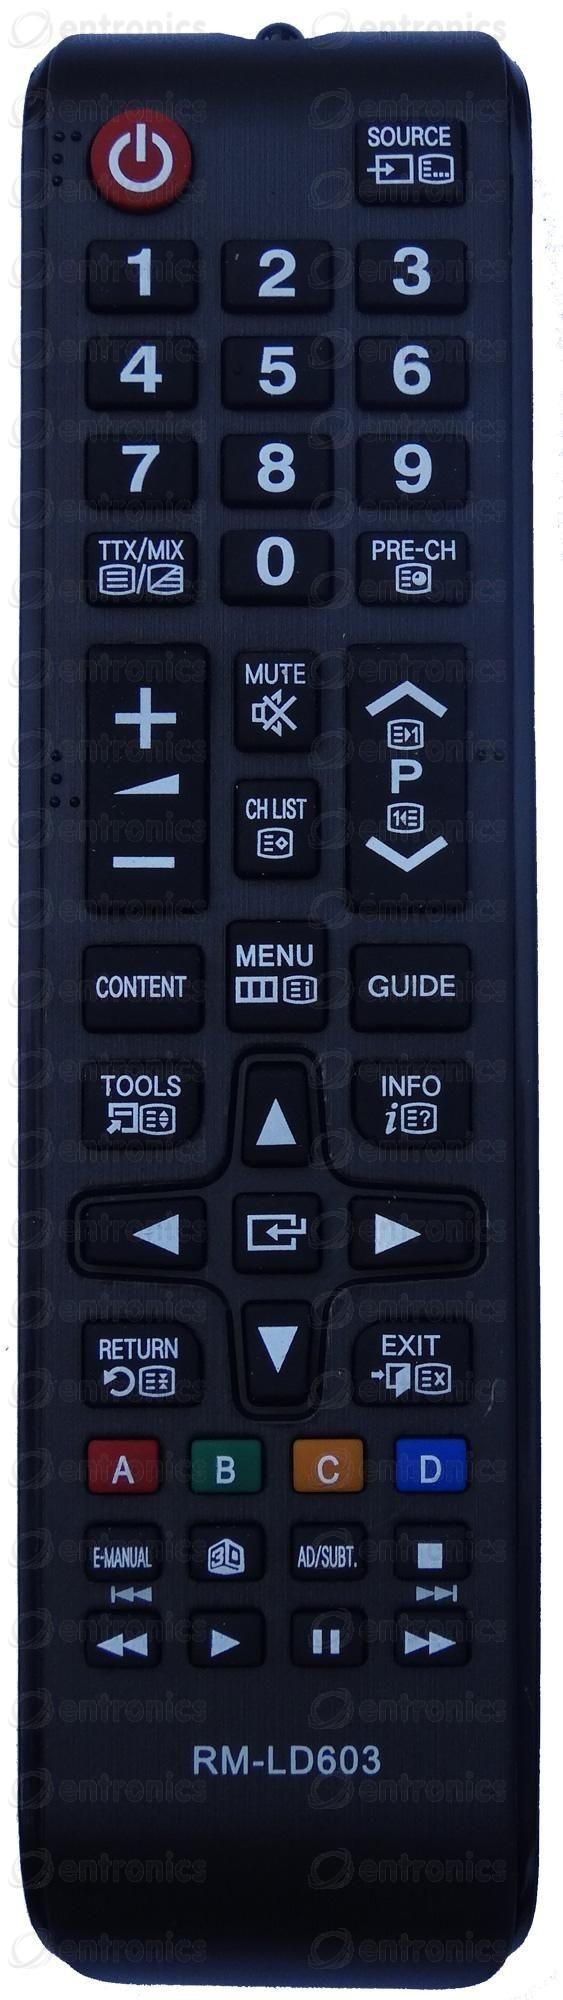 Дистанционно управление SAMSUNG AA59-00603A = RM-LD603